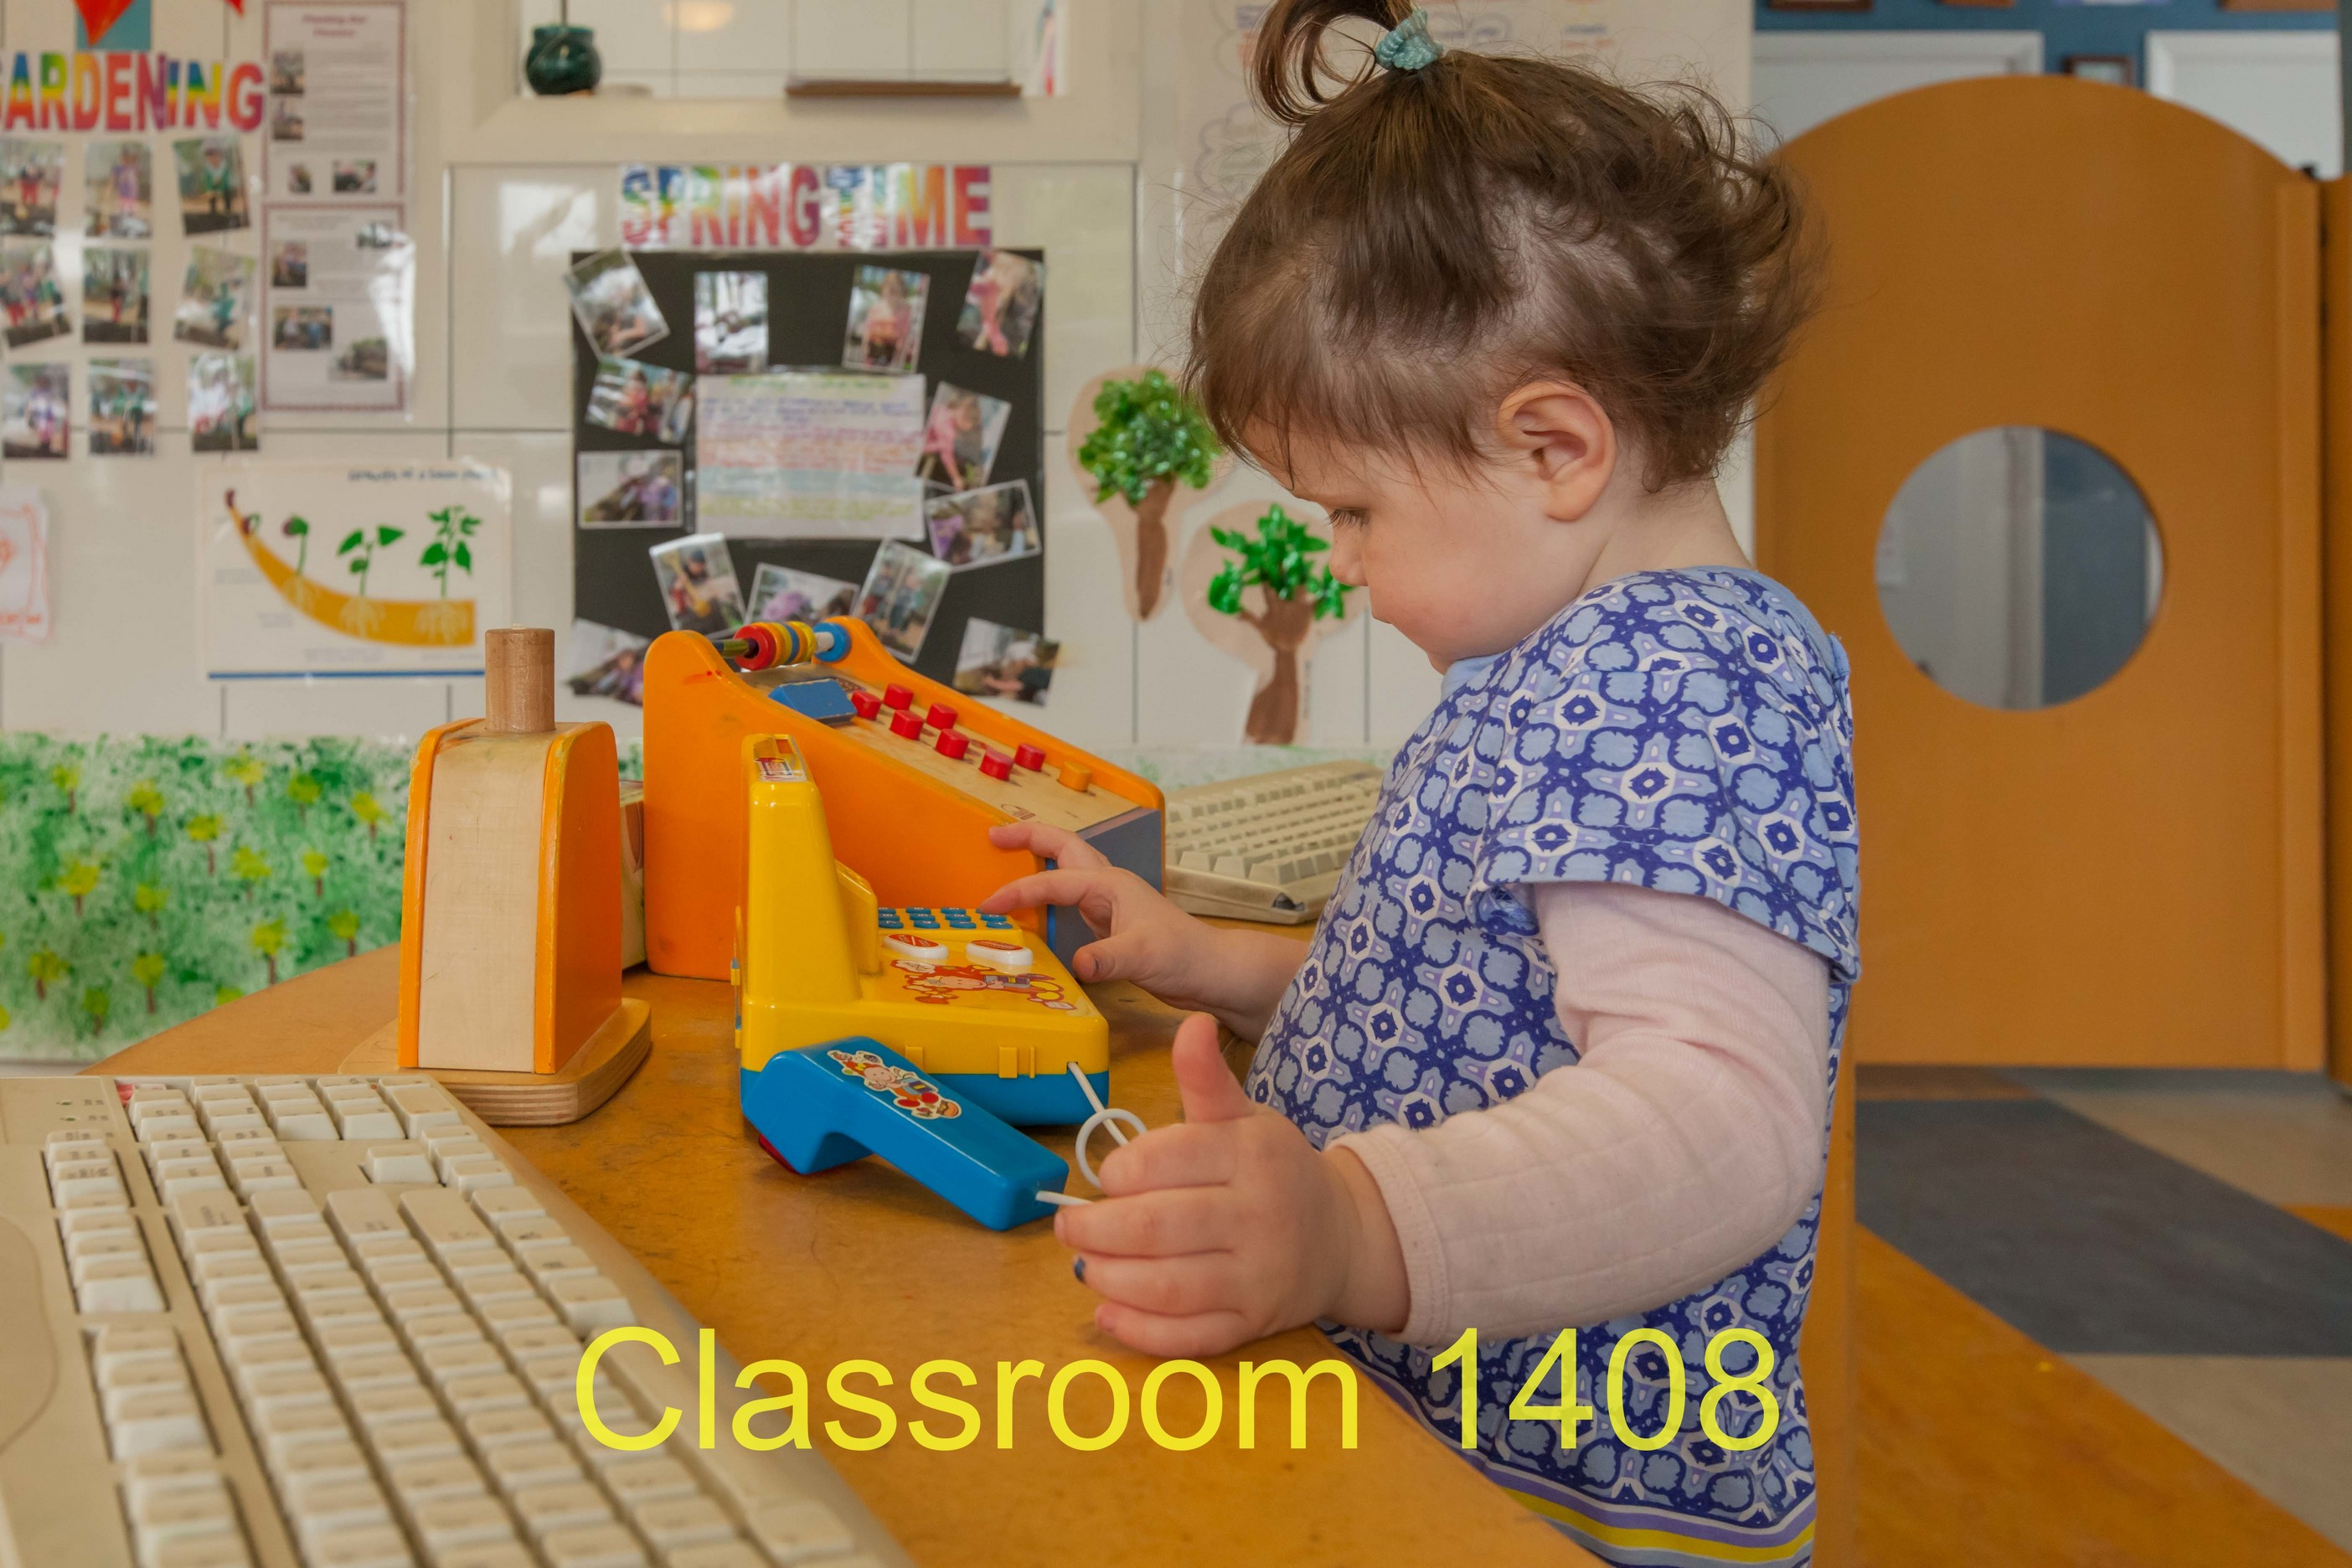 Classroom 1408